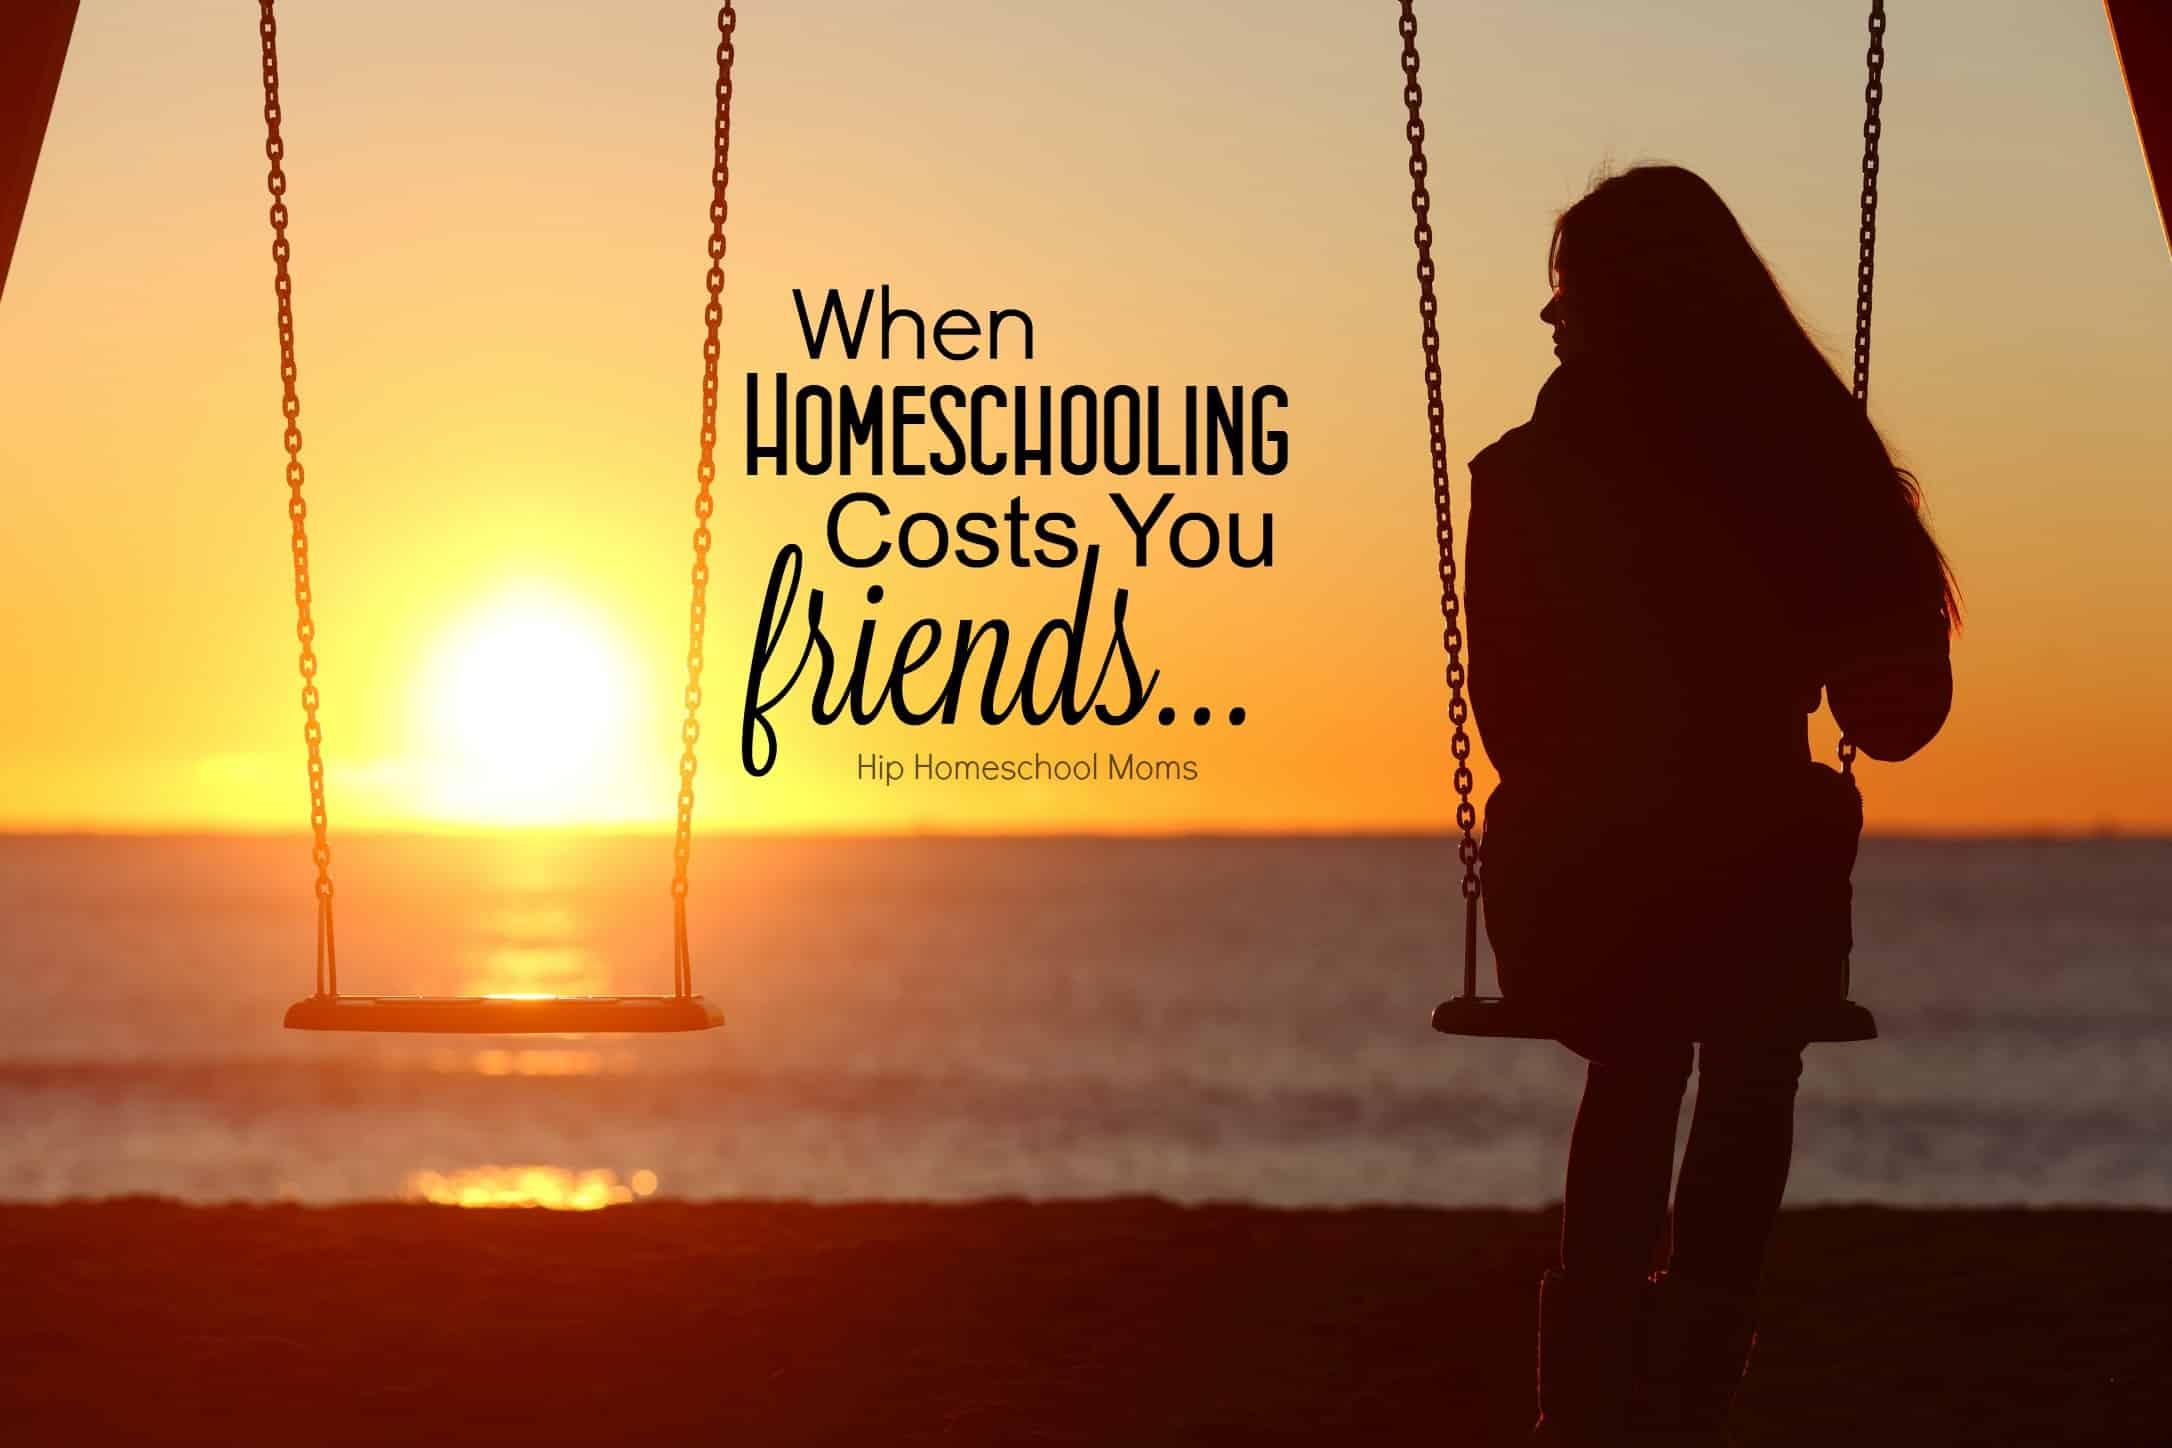 When Homeschooling Costs You Friends | Hip Homeschool Moms